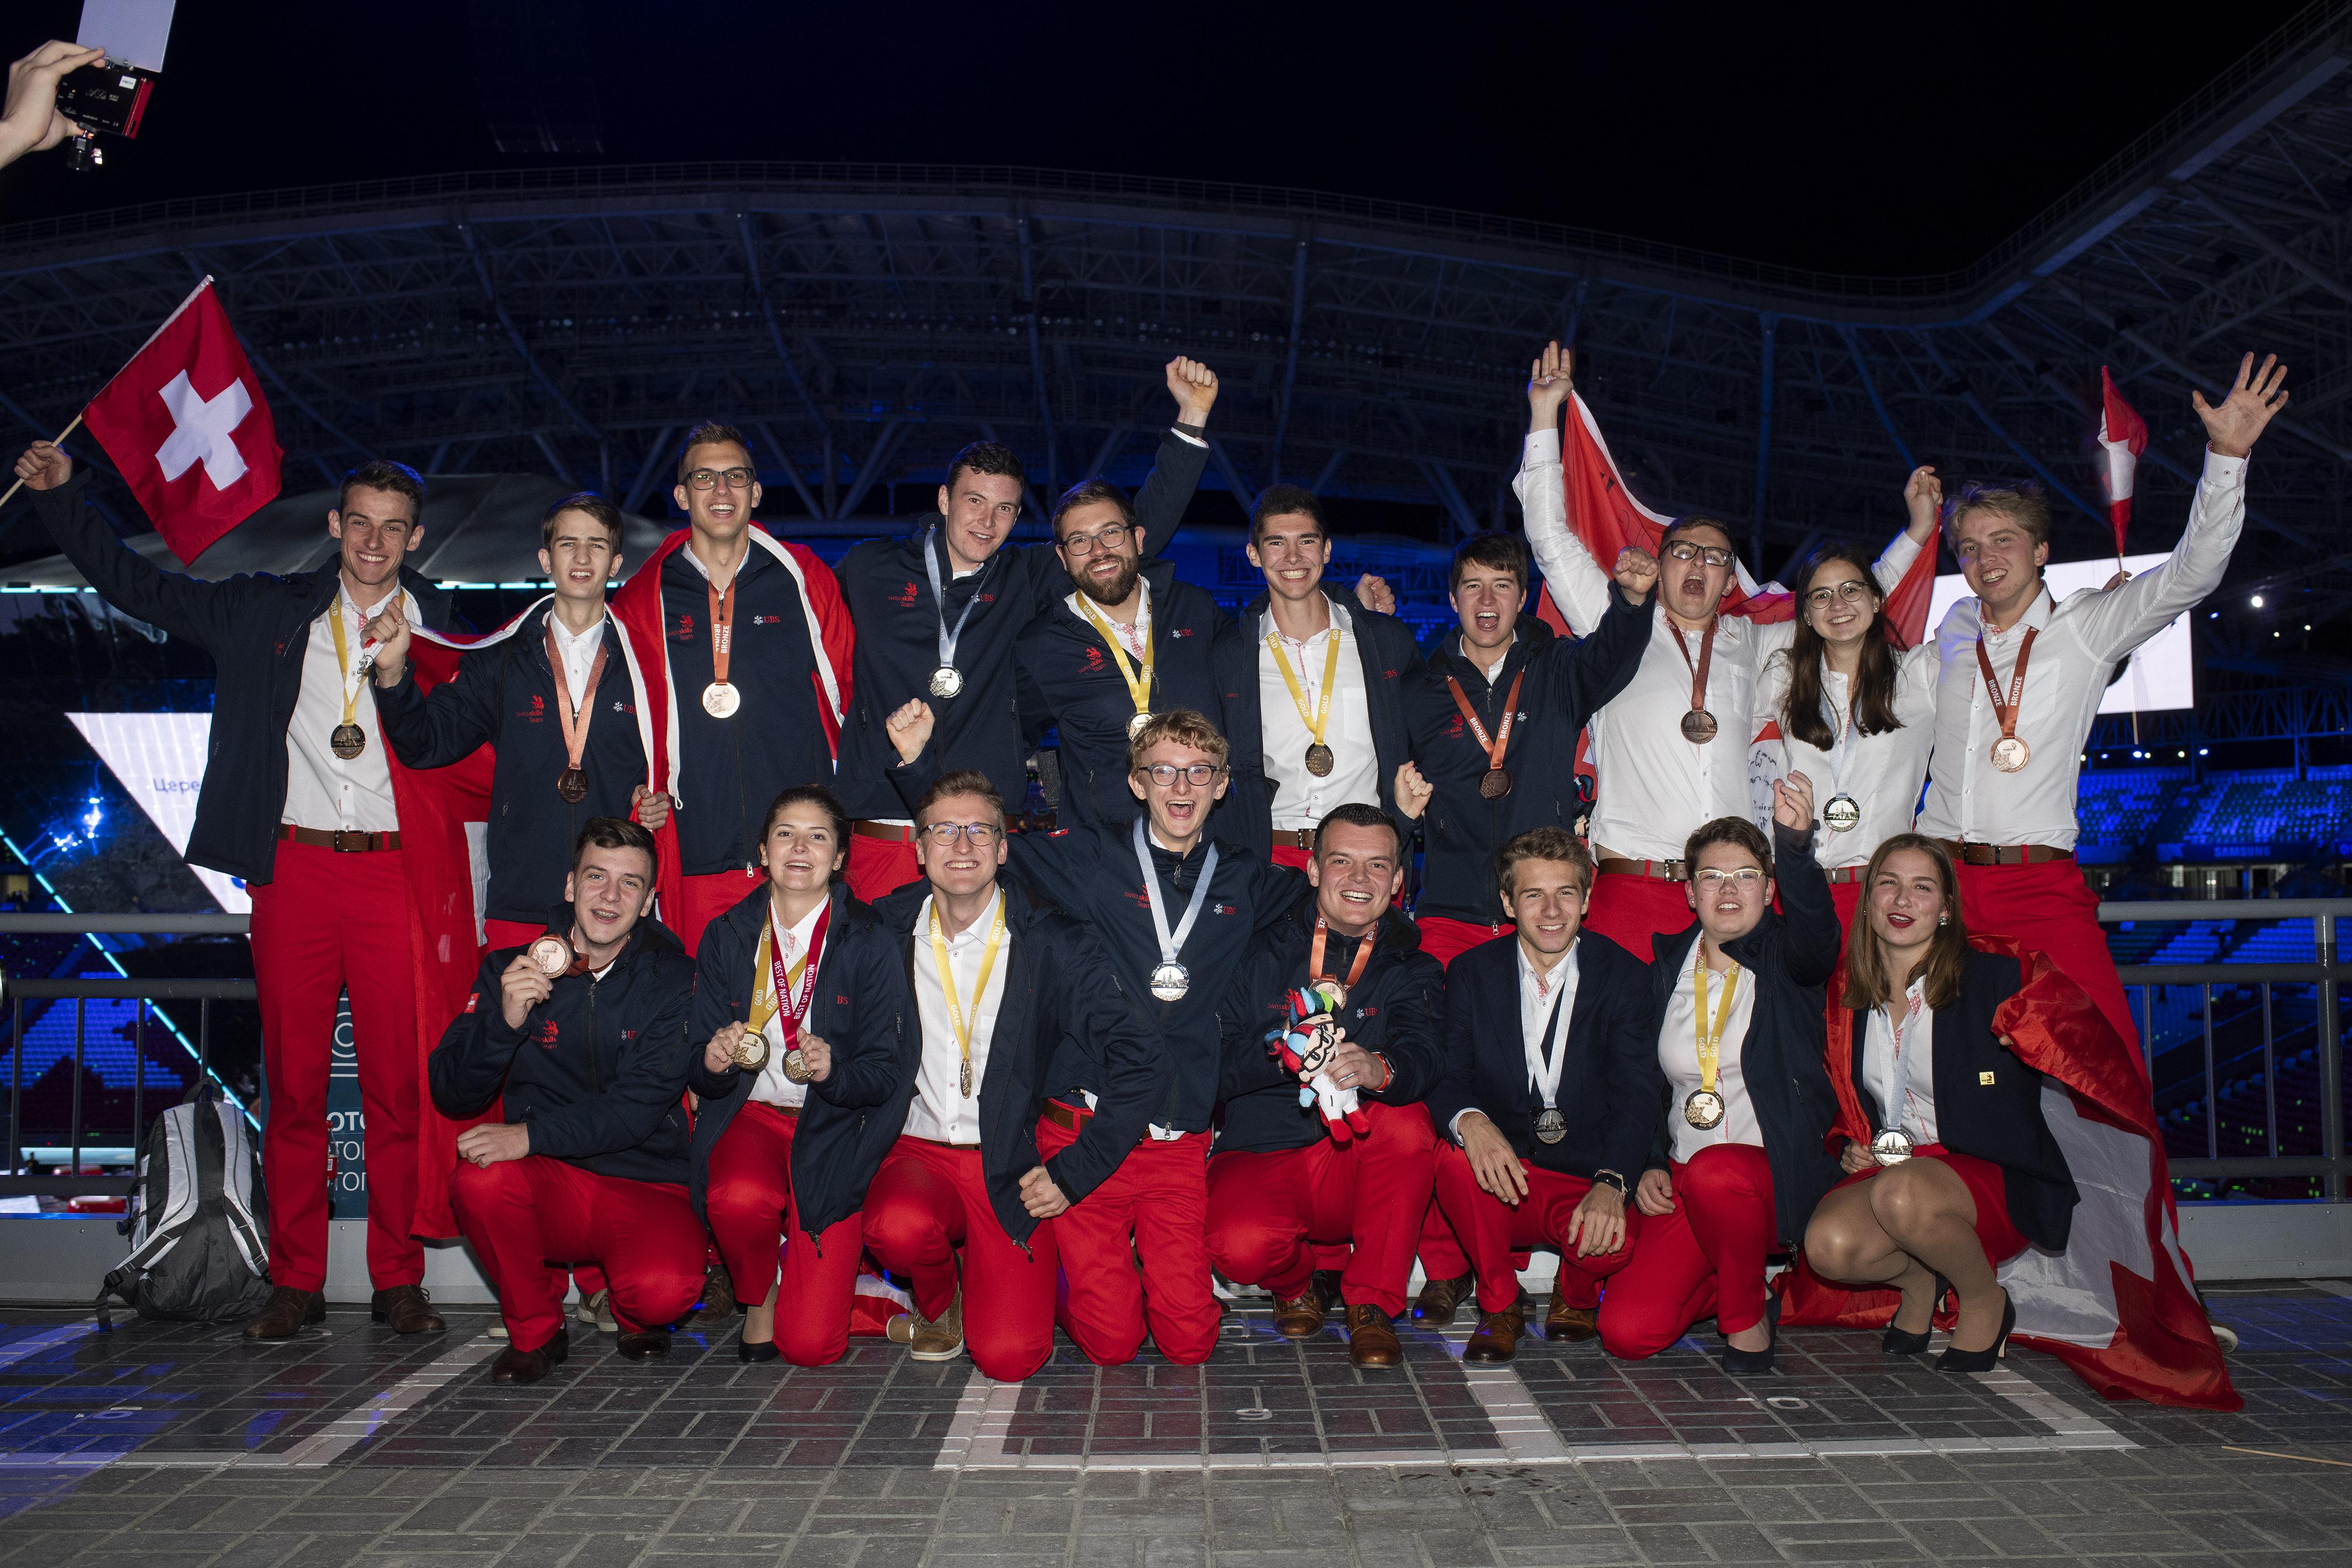 Bärenstarkes Berner Team holt an den WorldSkills 1x Gold, 1x Silber, 2x Bronze, 3 Diplome und 2 Zertifikate